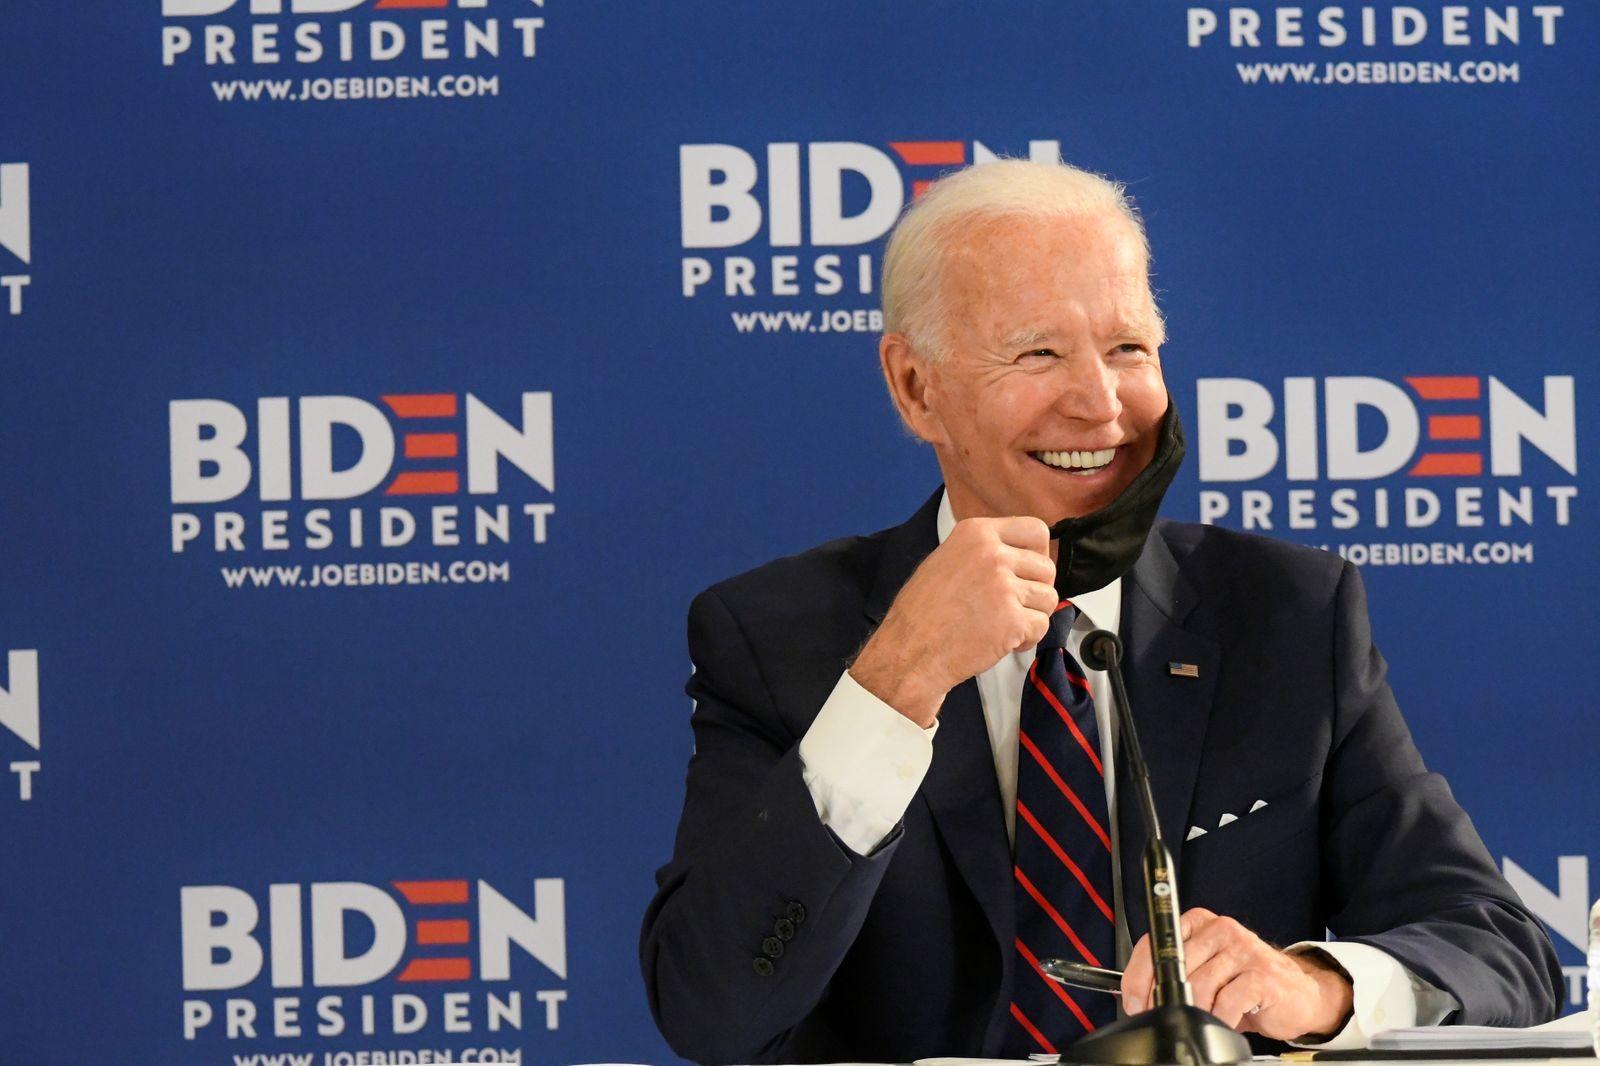 U.S. Democratic presidential candidate Joe Biden speaks during campaign event in Philadelphia